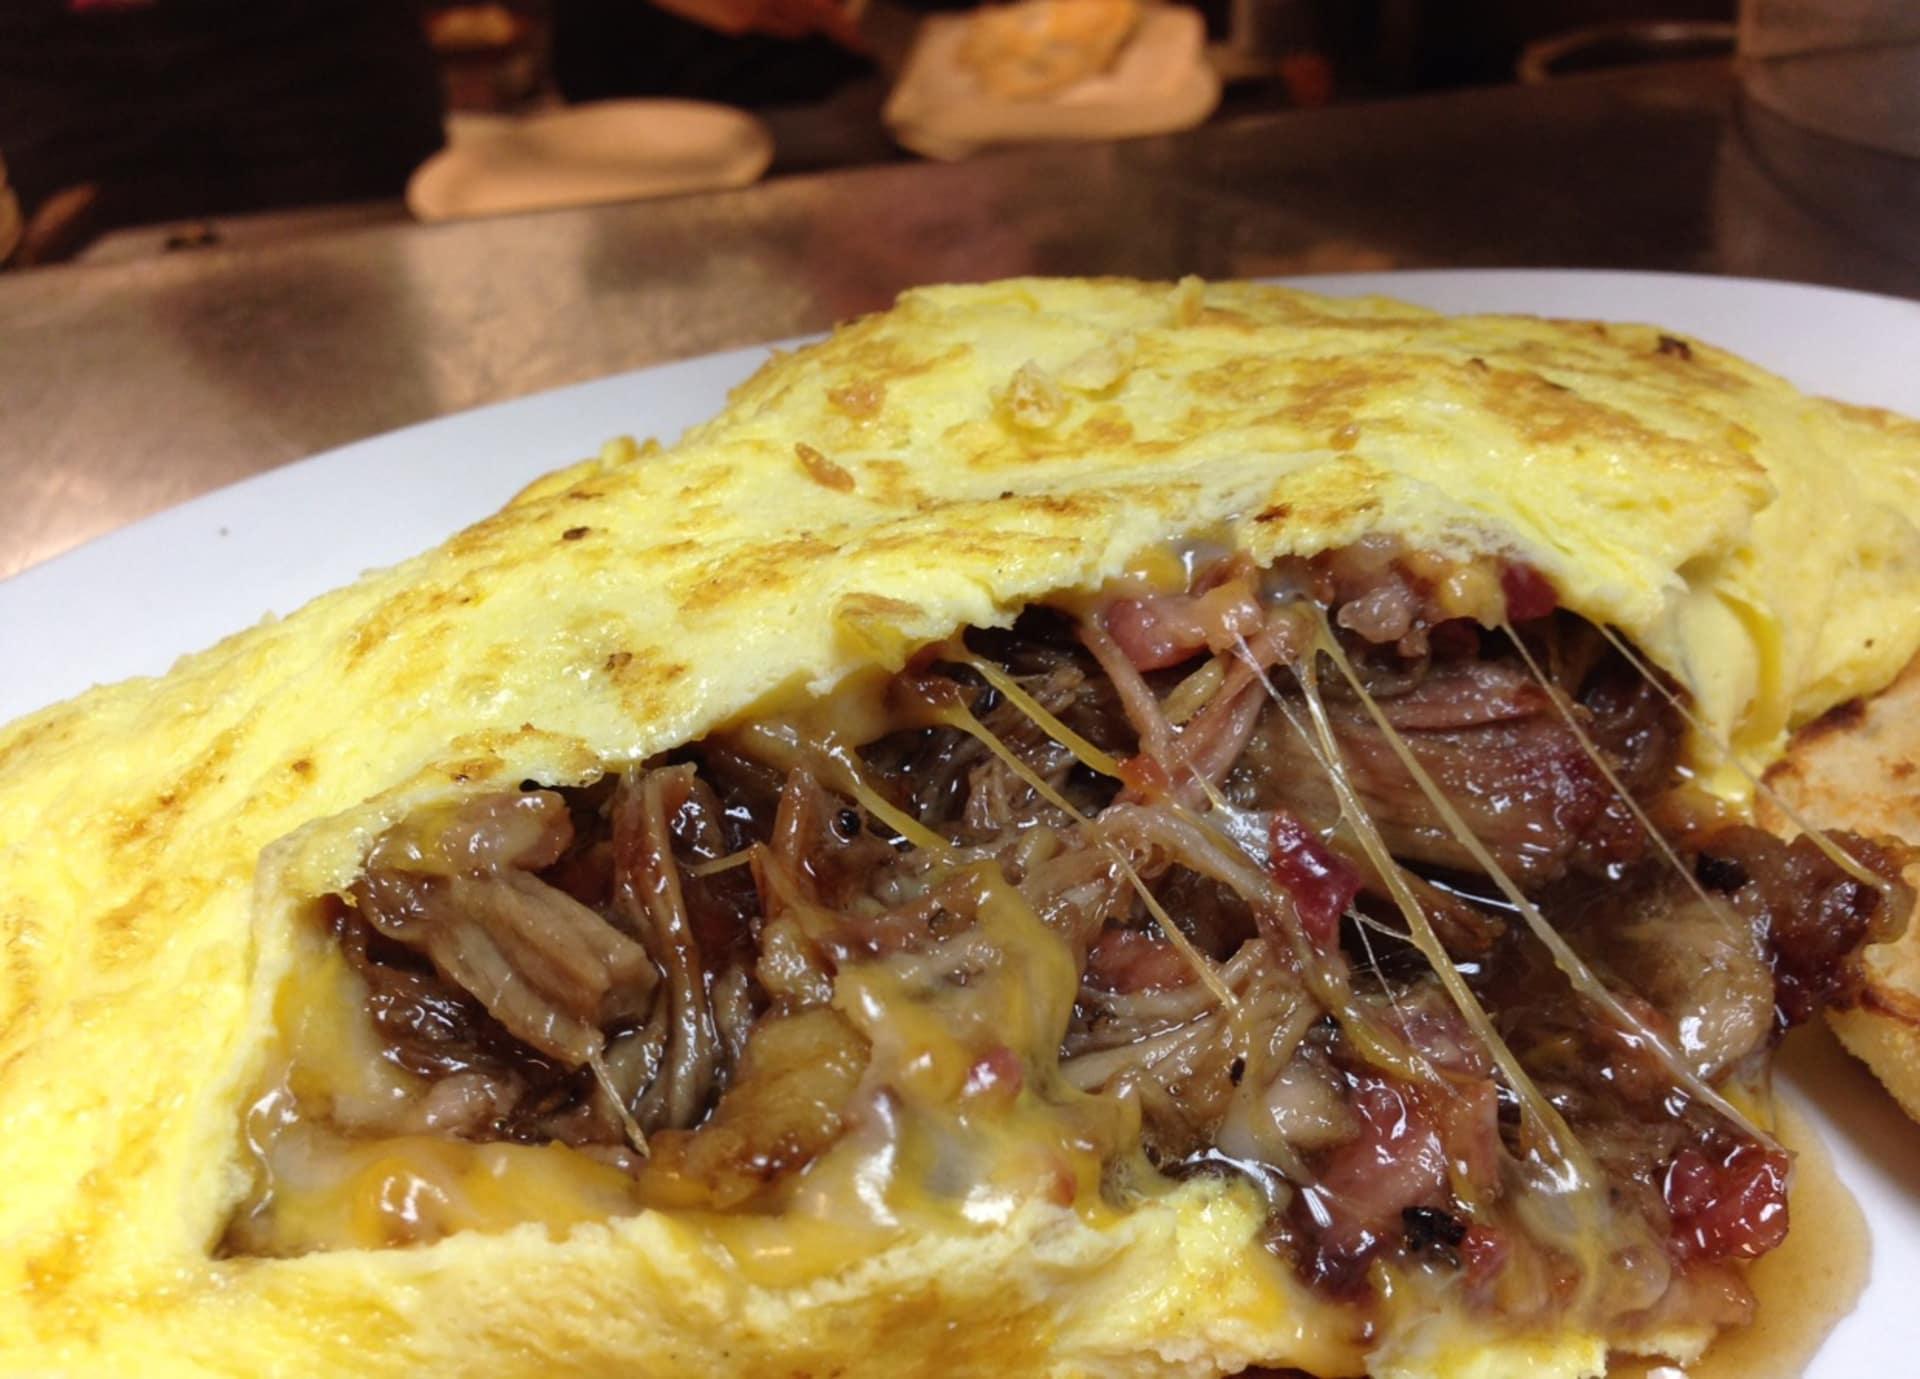 Jack Daniel's Pulled Pork Omelet